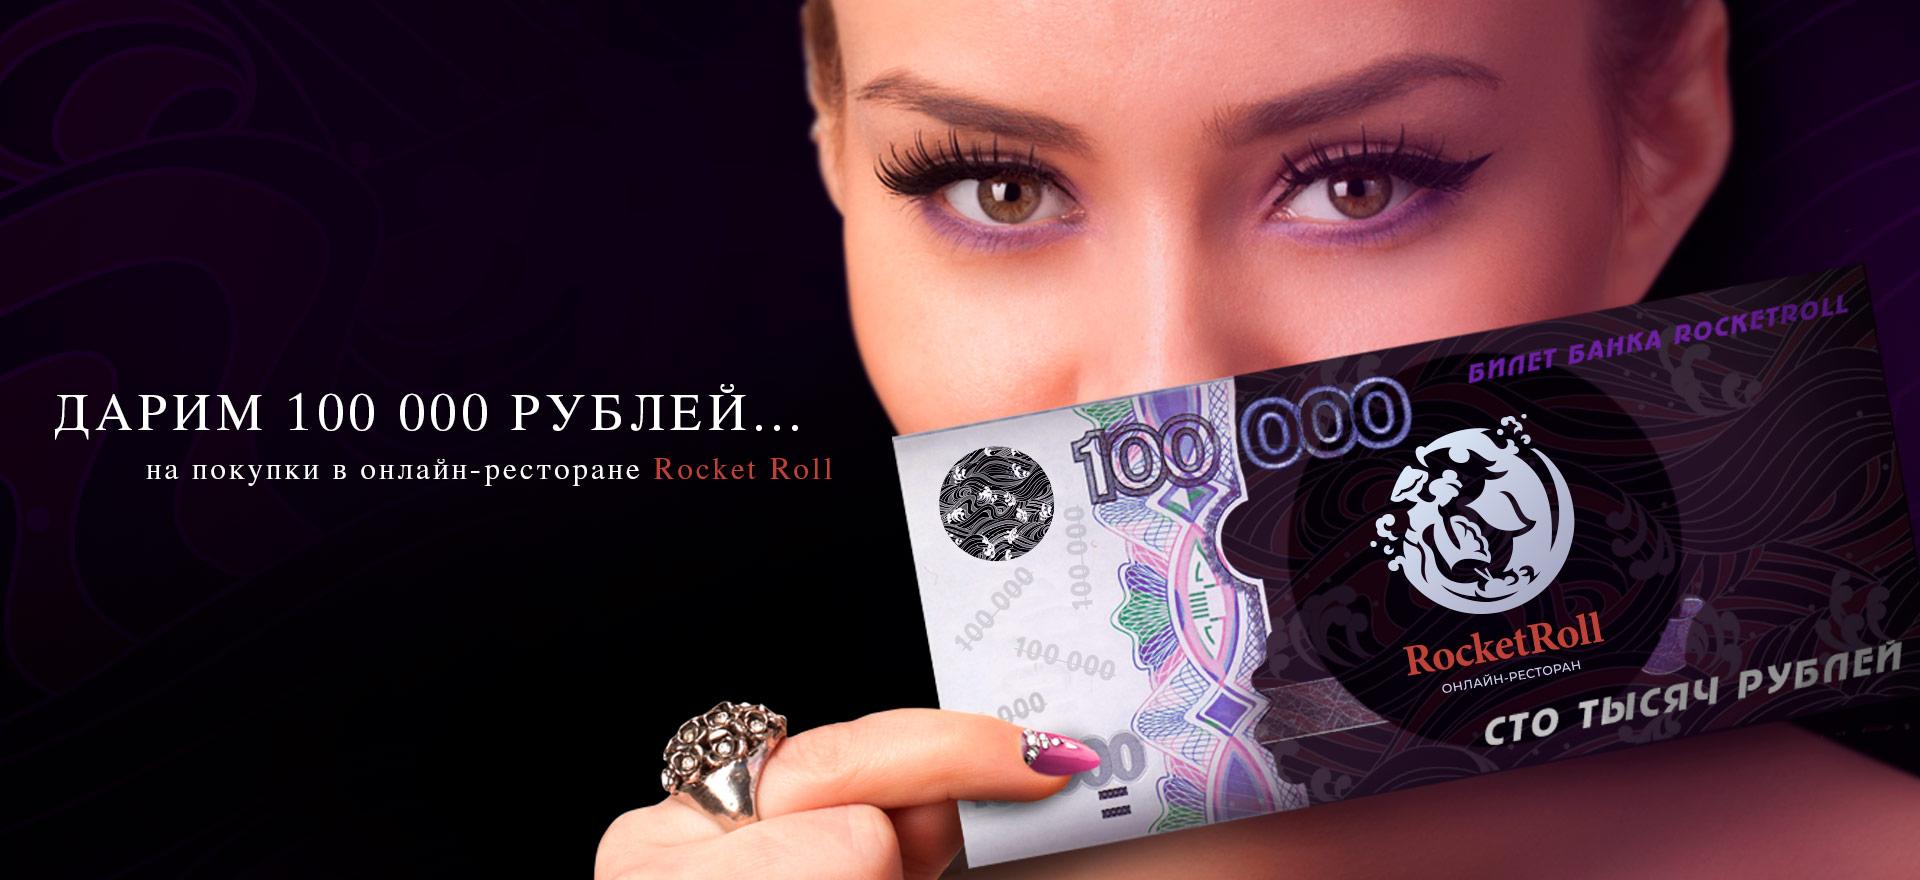 Дарим 100 000 рублей на покупки в ресторане Рокет Ролл